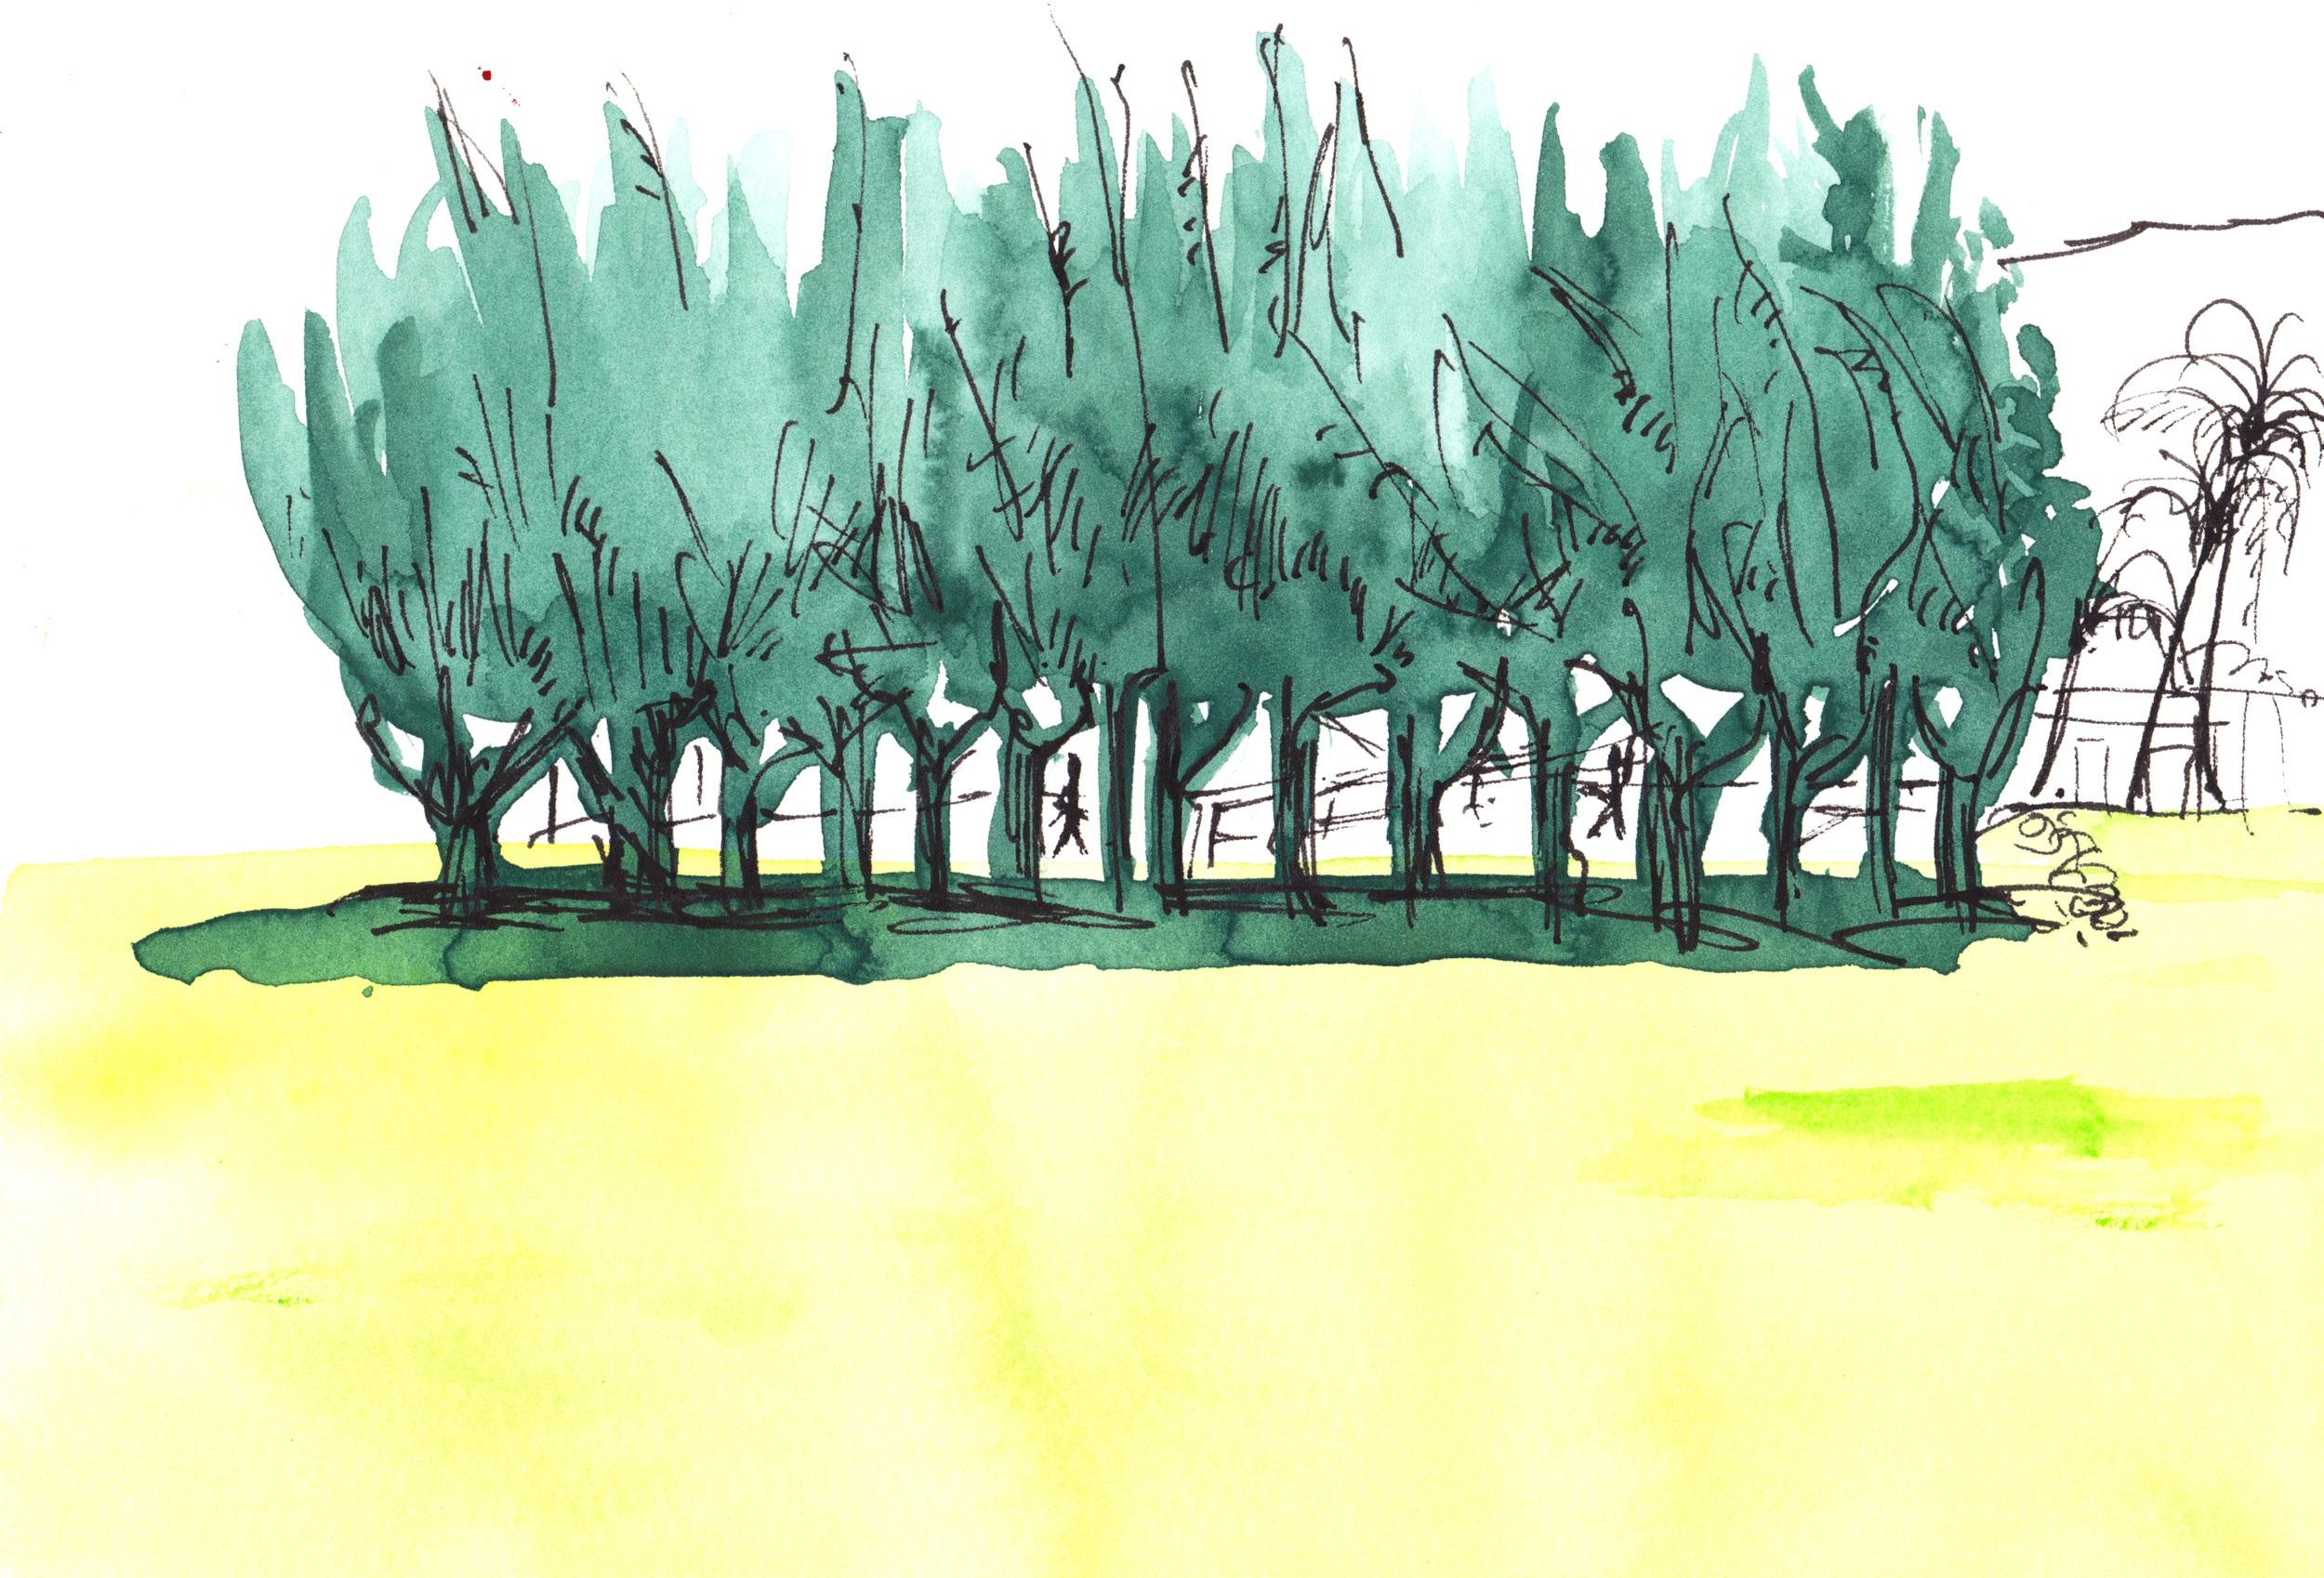 maui_greenlandscape-4.jpg